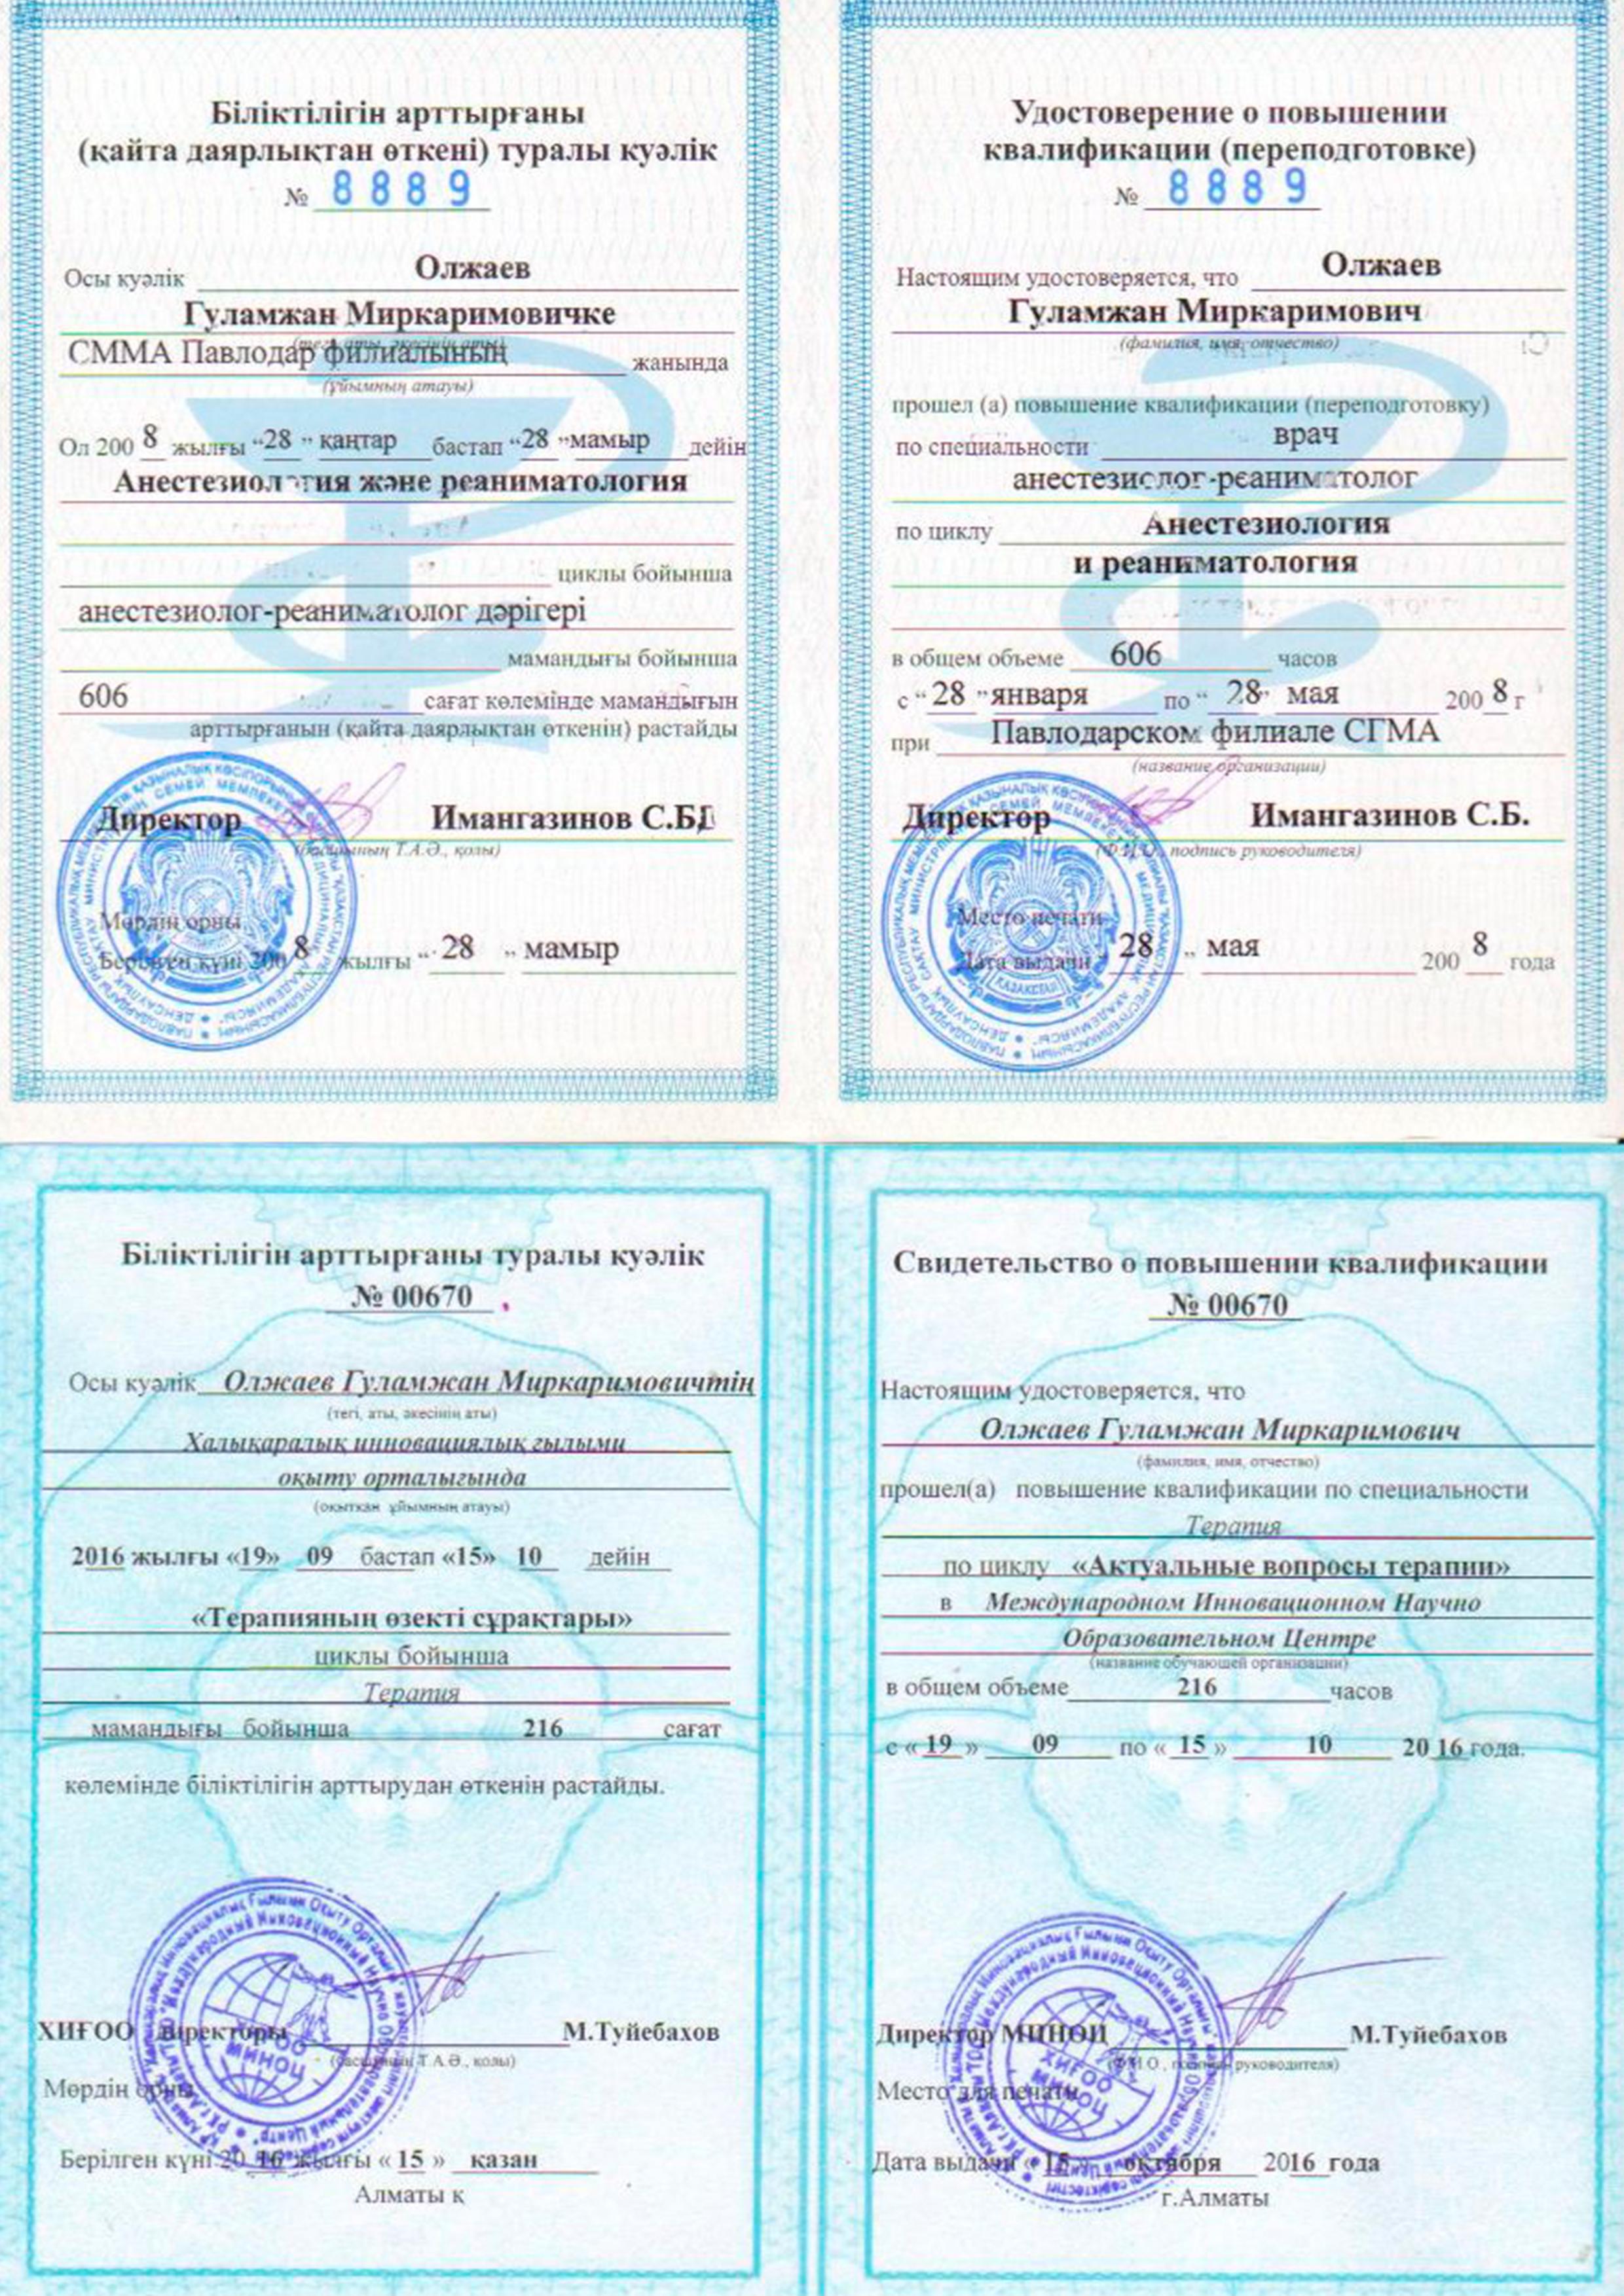 Первичка Терапевта клиники Akniet Shipa сайрамский р-н. с. Карабулак